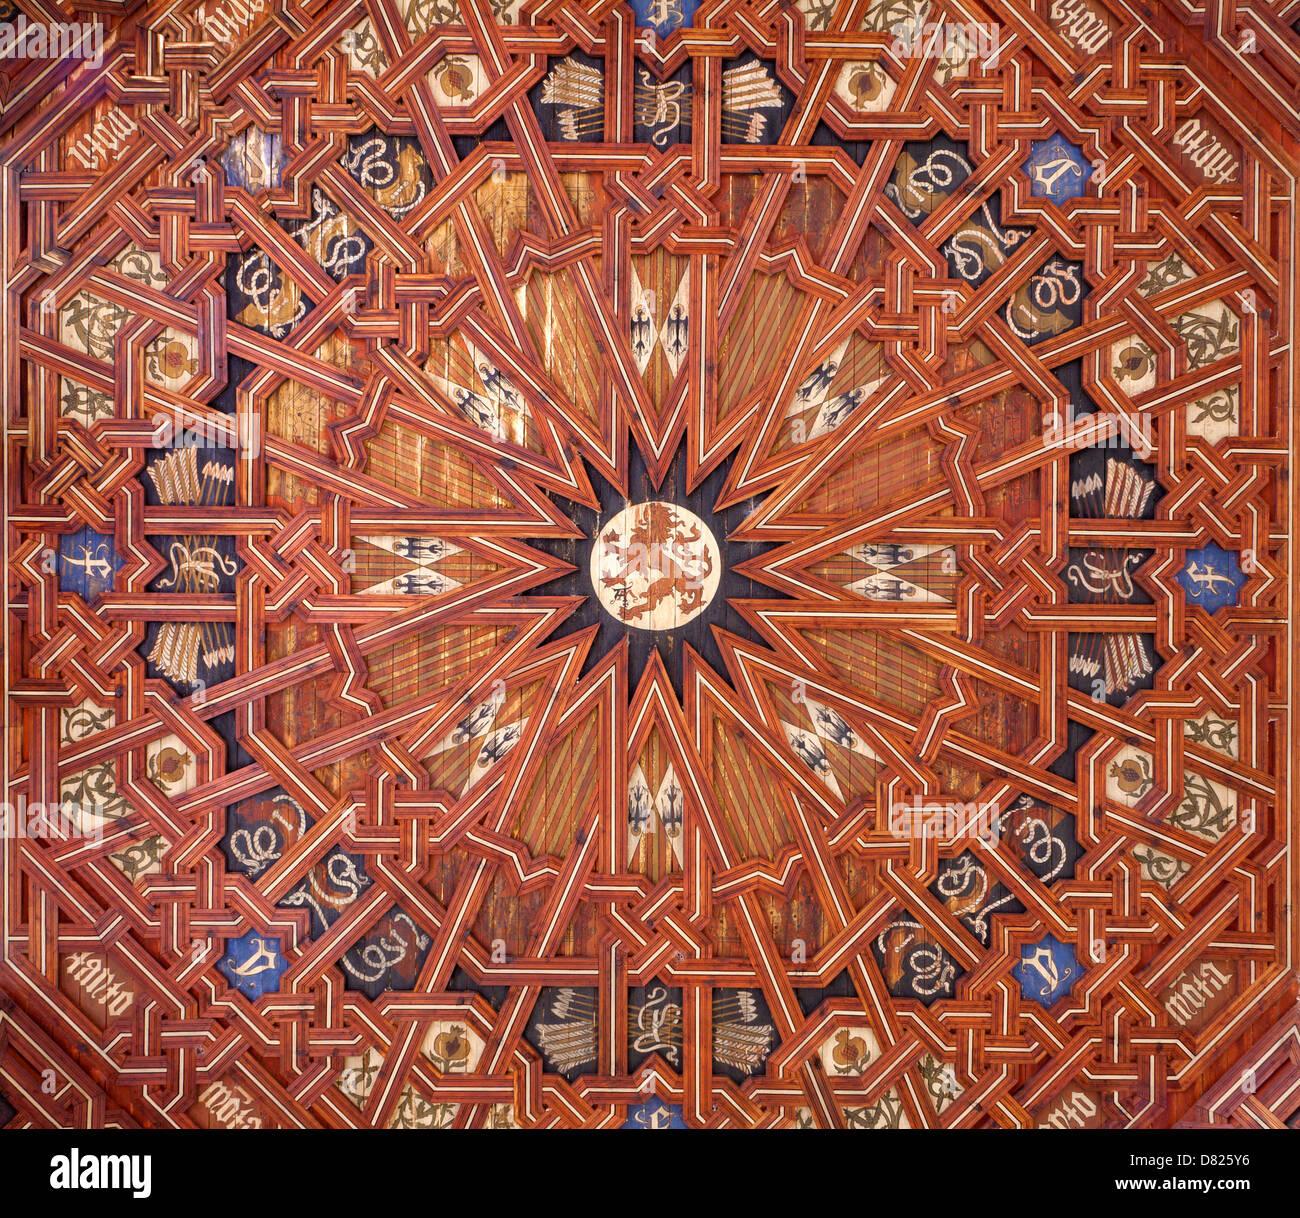 TOLEDO - MARCH 8: Ceiling of atrium of Monasterio San Juan de los Reyes or Monastery of Saint John of the Kings Stock Photo